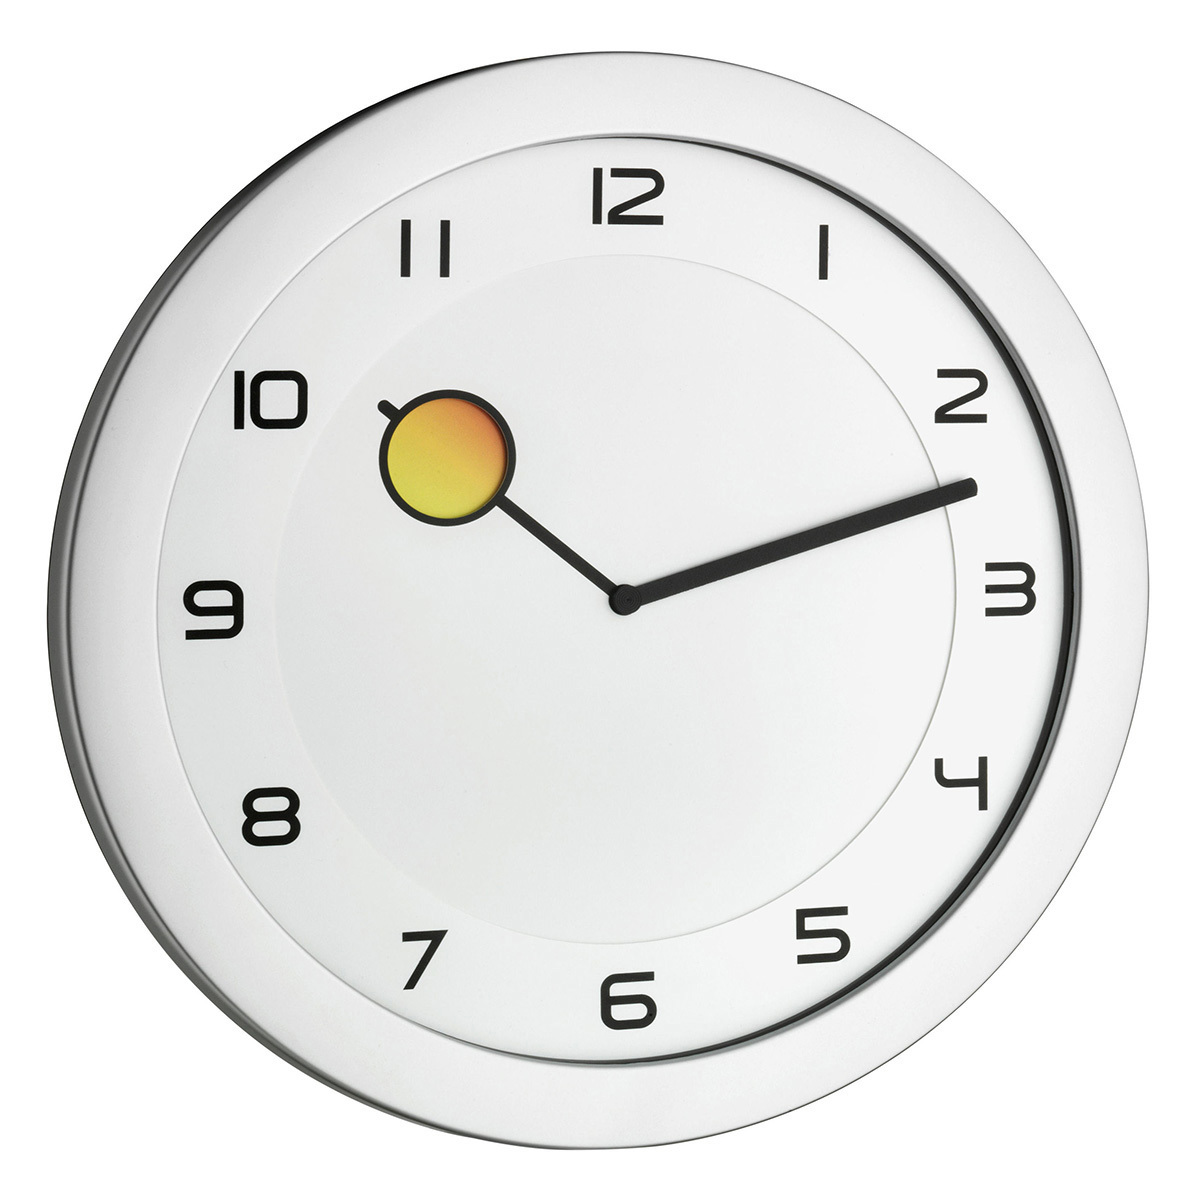 60-3028-54-analoge-wanduhr-happy-hour-gelb-1200x1200px.jpg